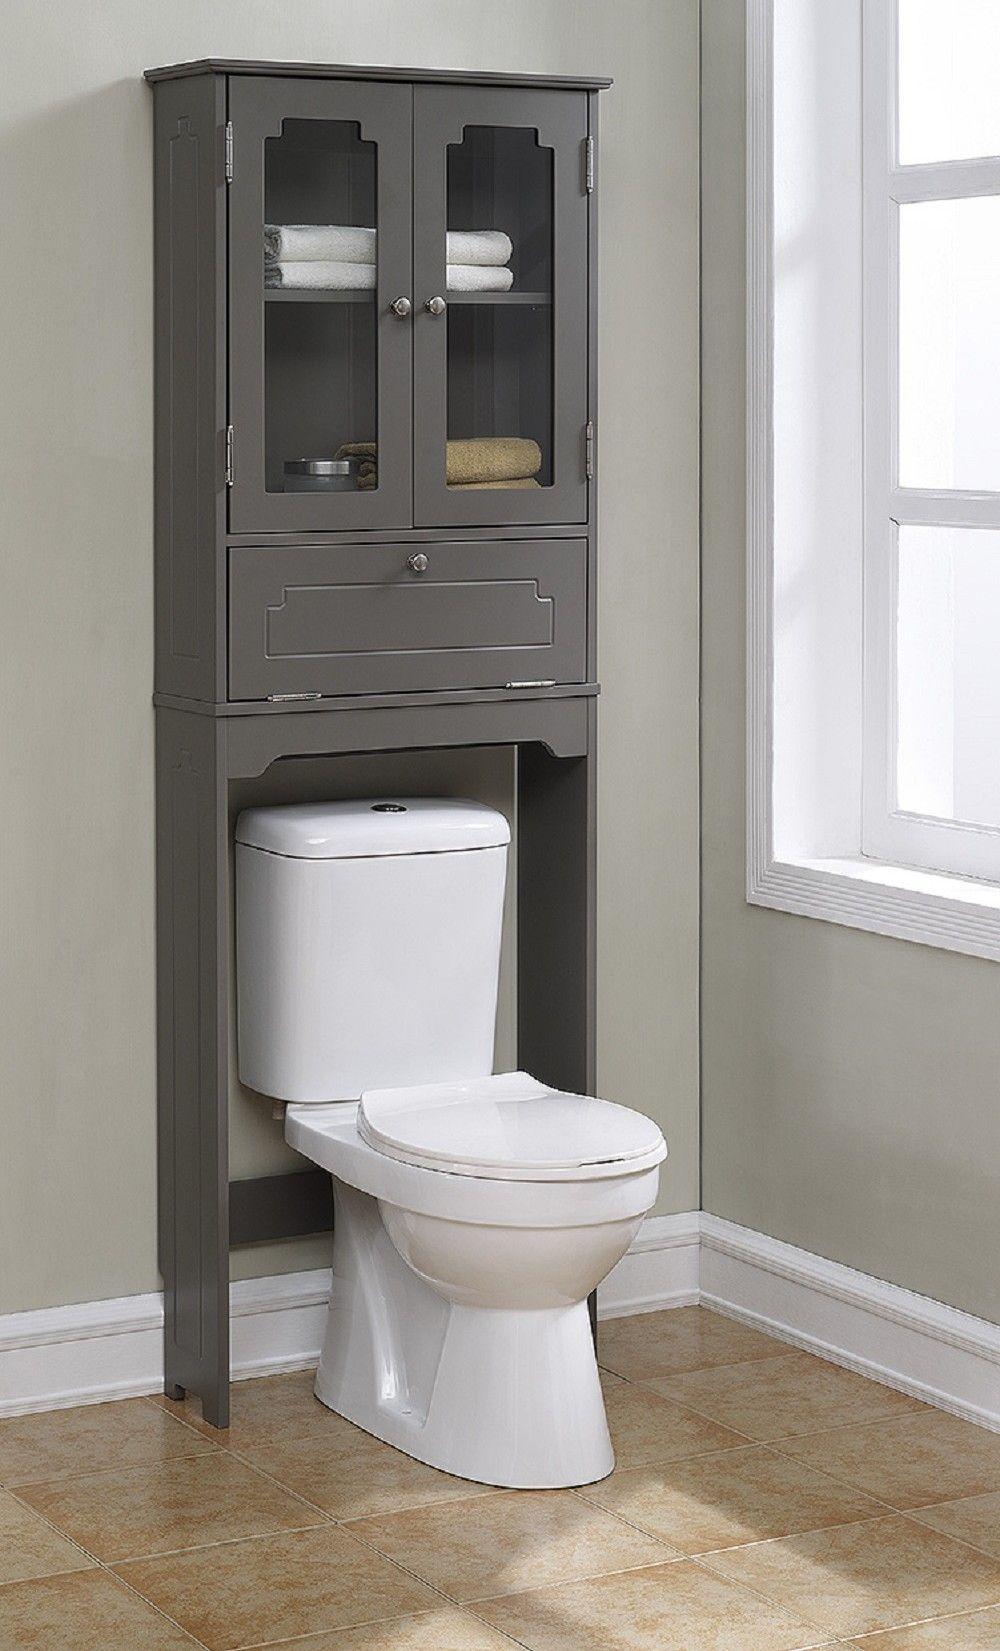 Features: -Elegant etagere with 2 glass doors, 1 adjustable shelf, 1 ...